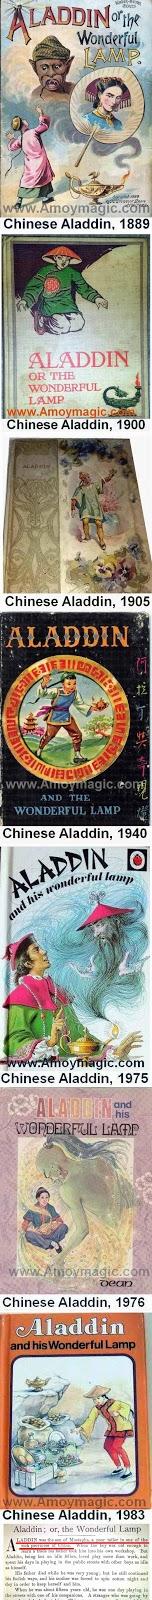 Aladdin Chinese Sinbad Cinderella Amoy Xiamen Fujian Quanzhou Zayton 阿拉丁,辛巴得和灰姑娘都是中国人